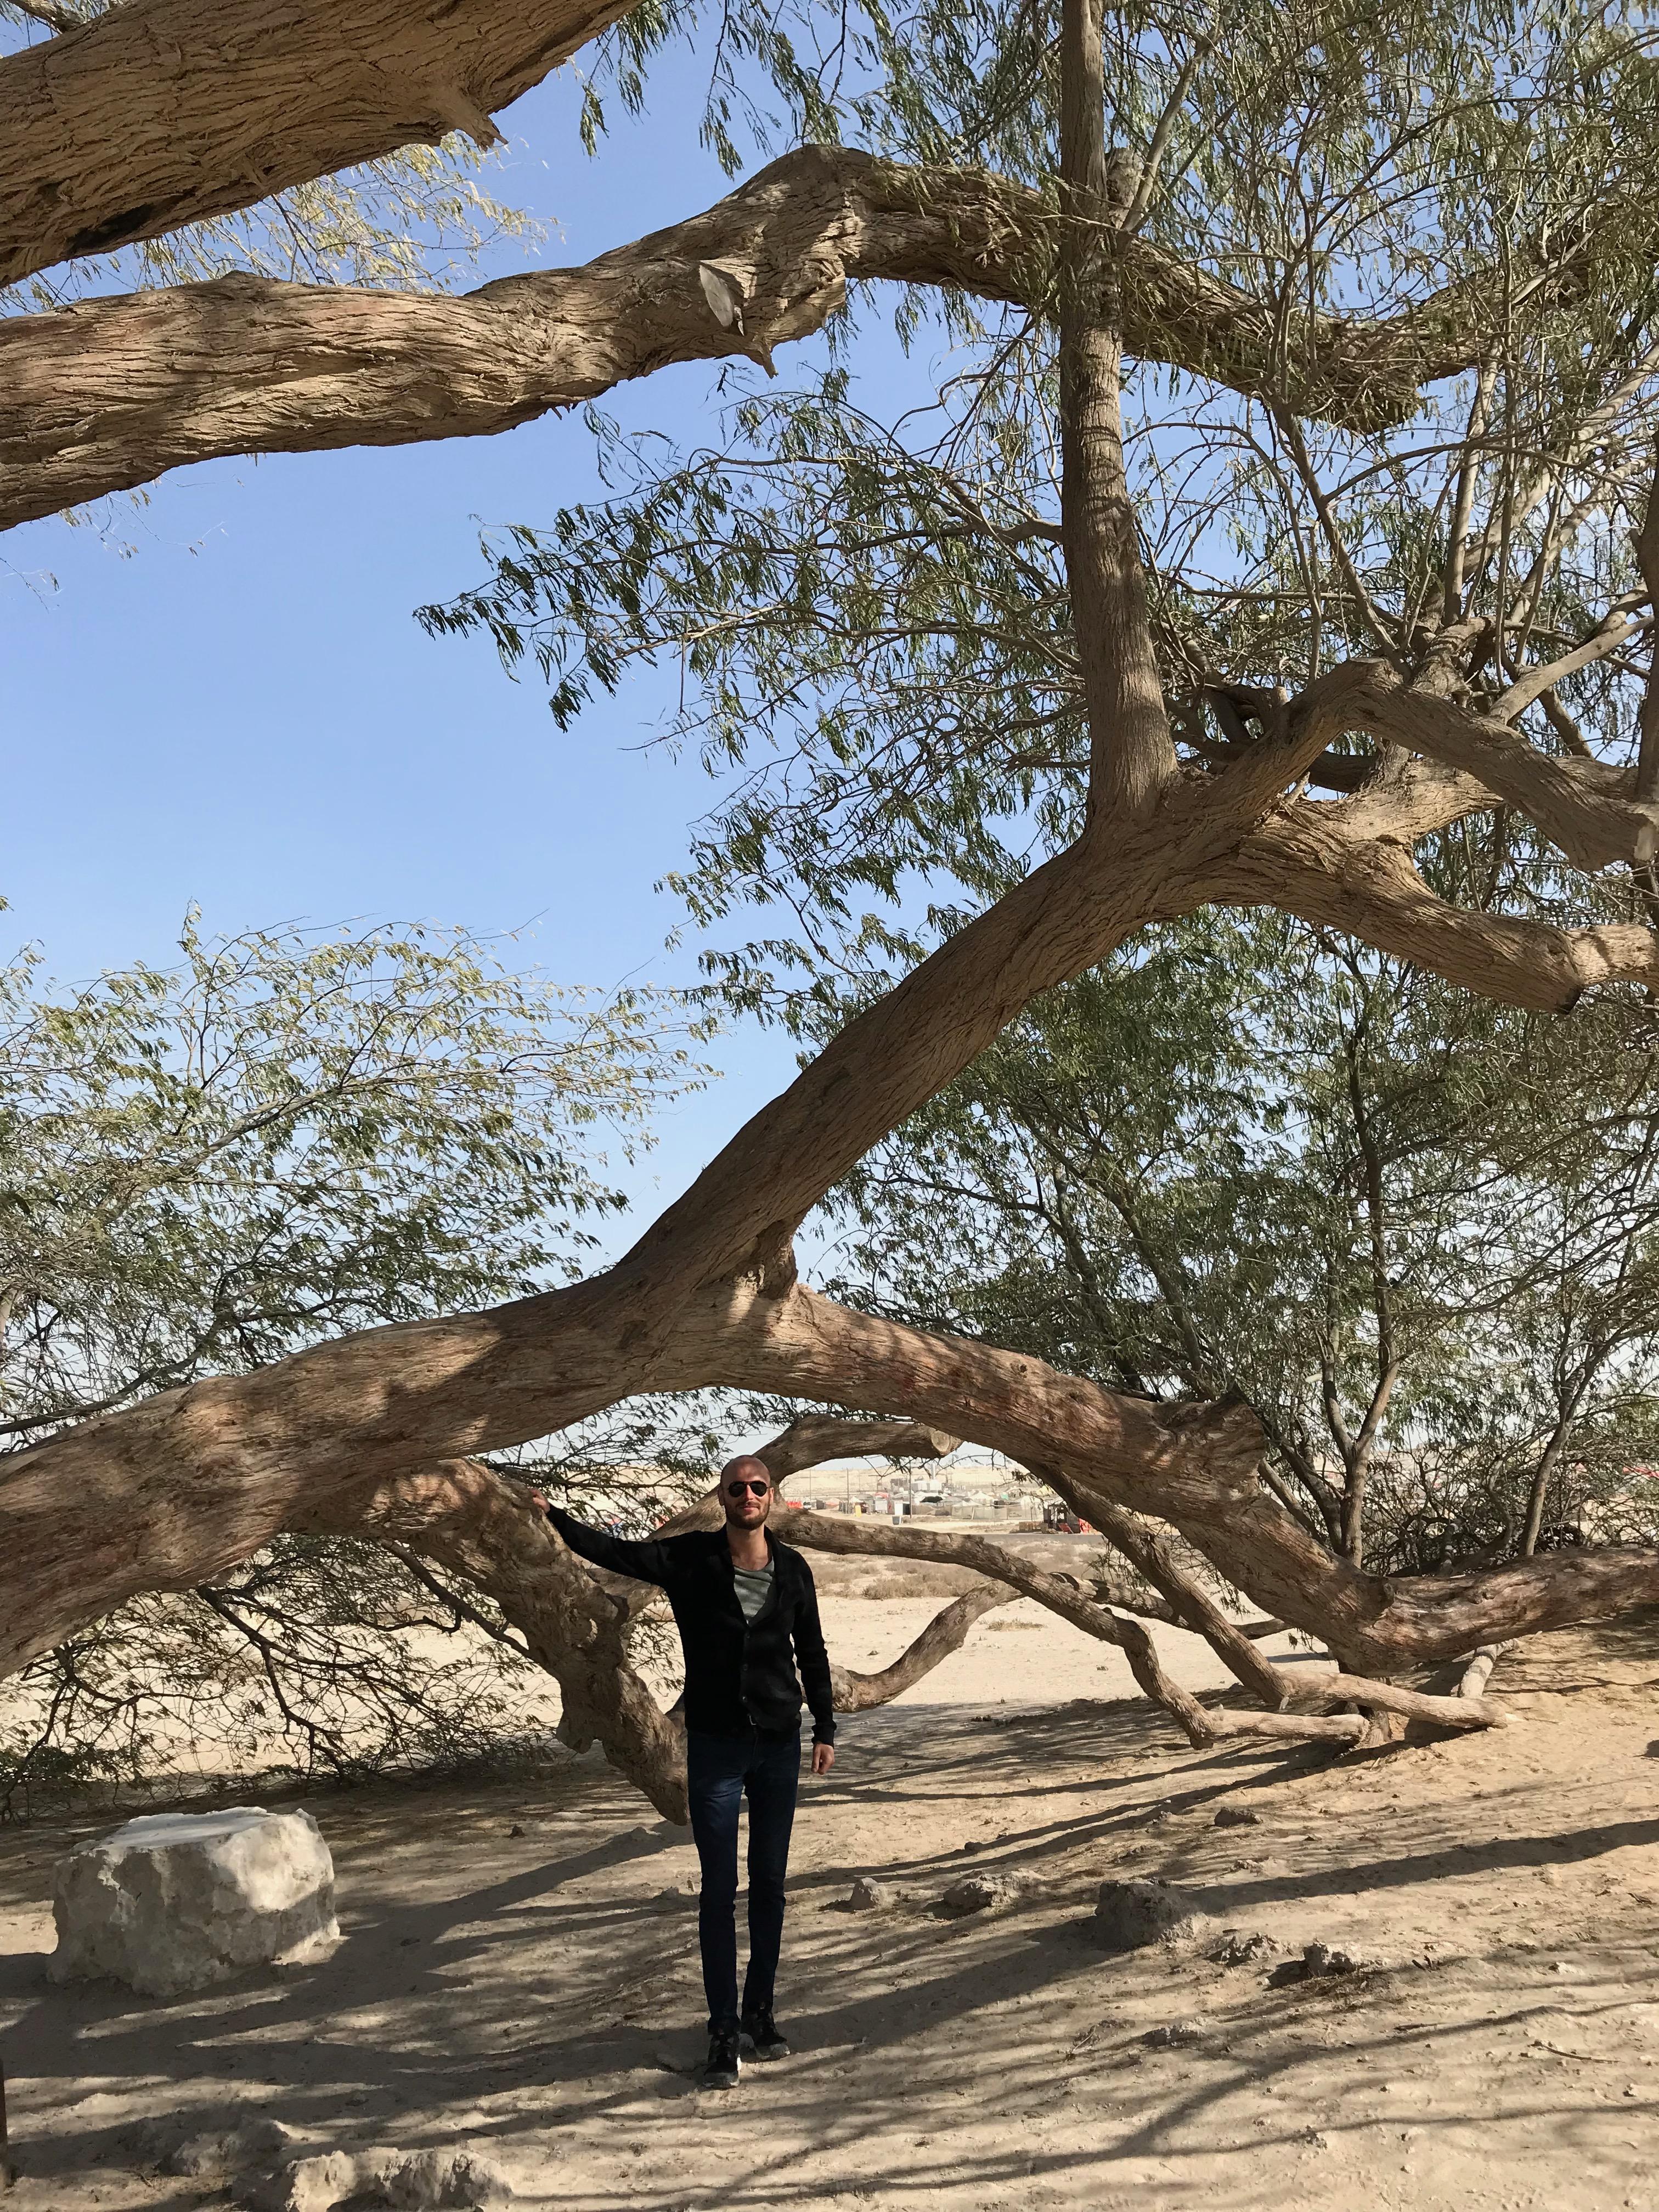 tree of life bahrain 1 1